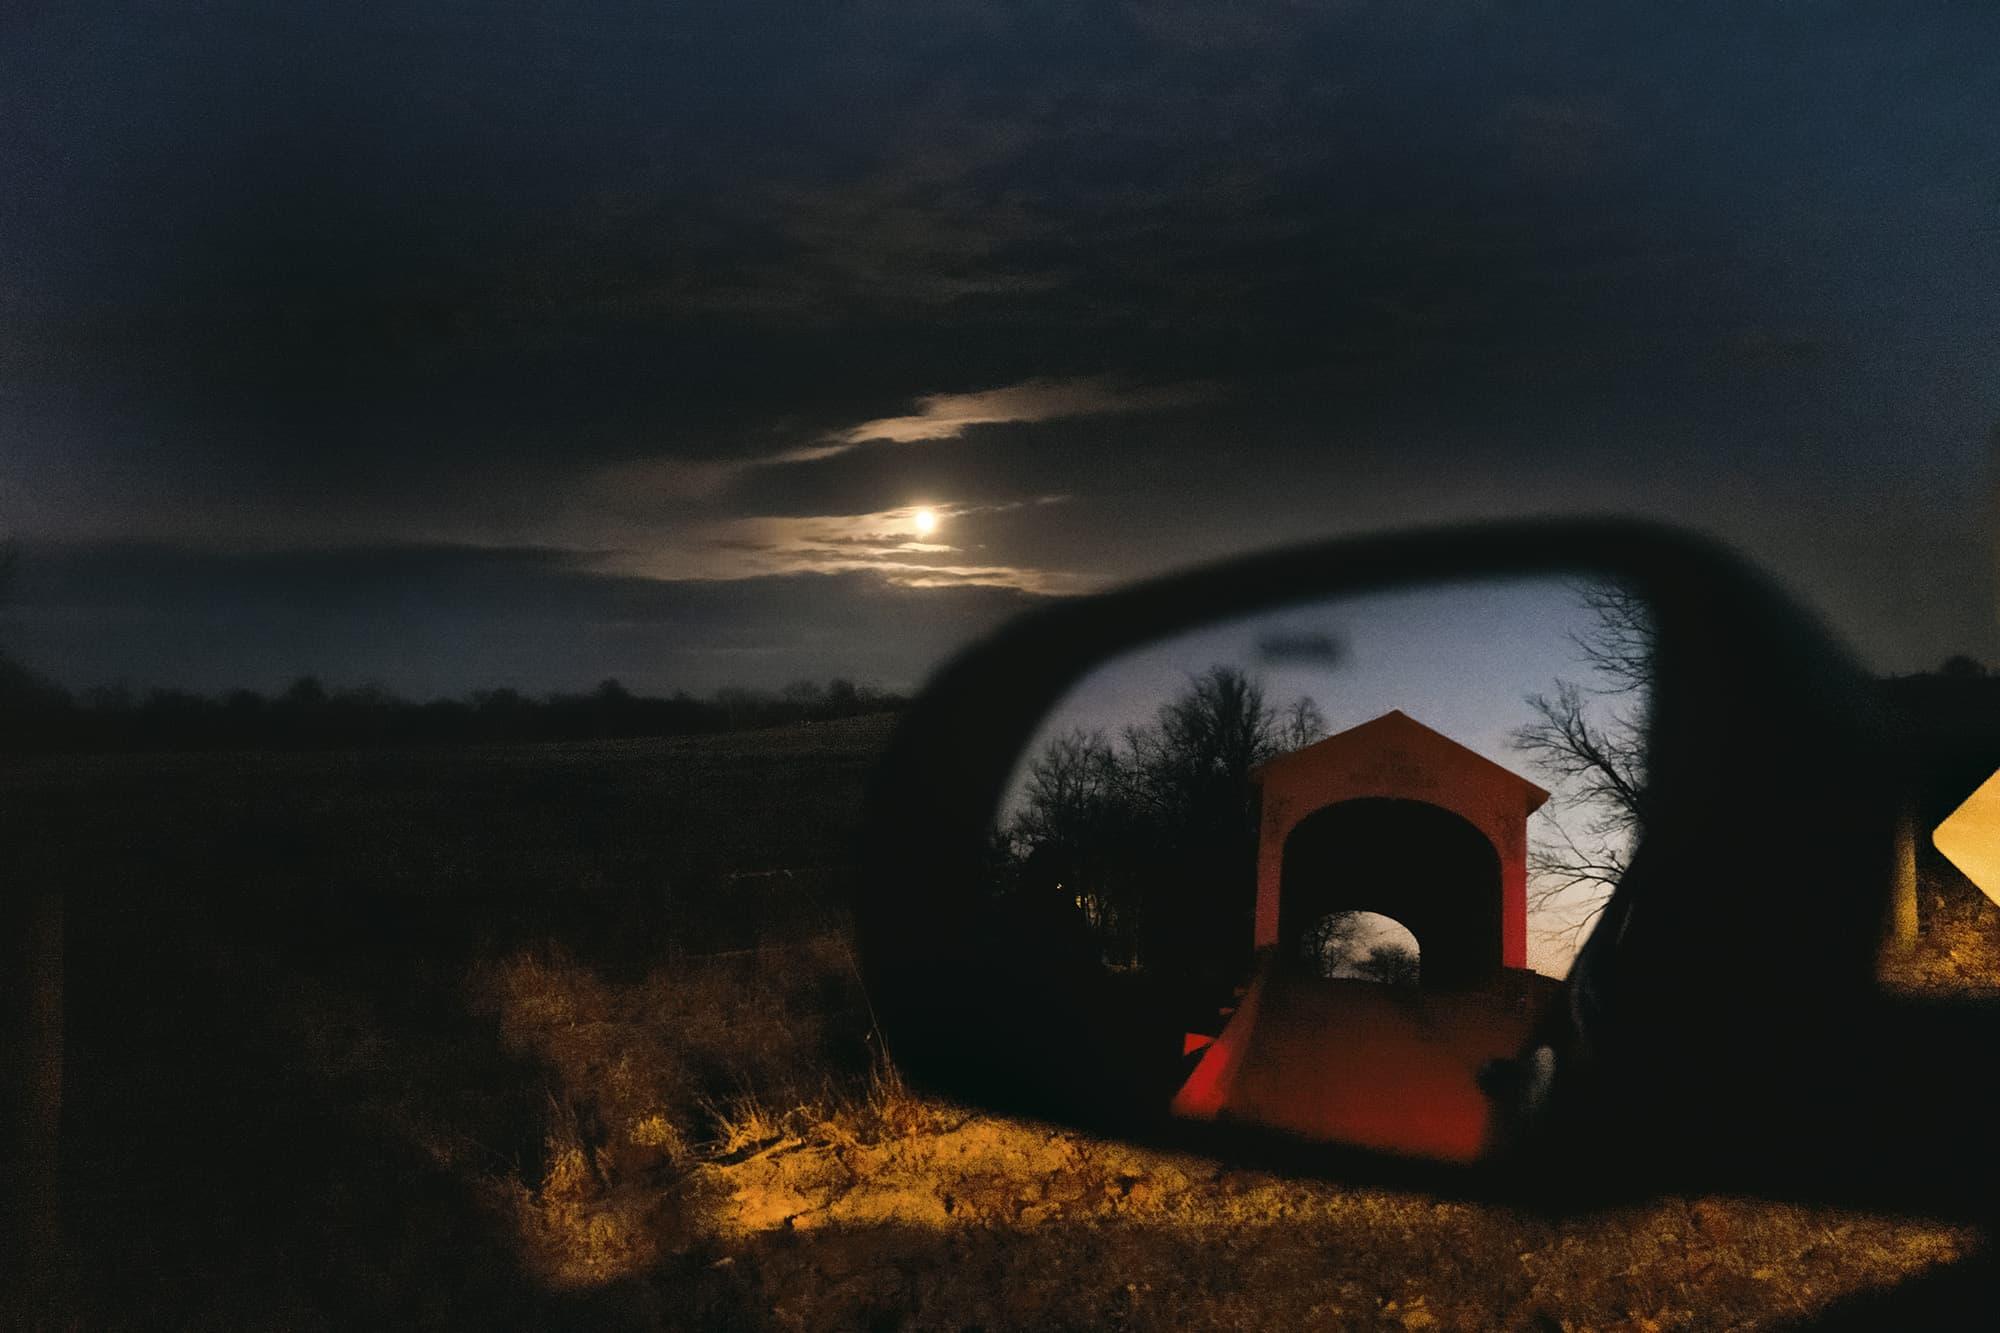 rebecca-norris-webb-night-calls-17